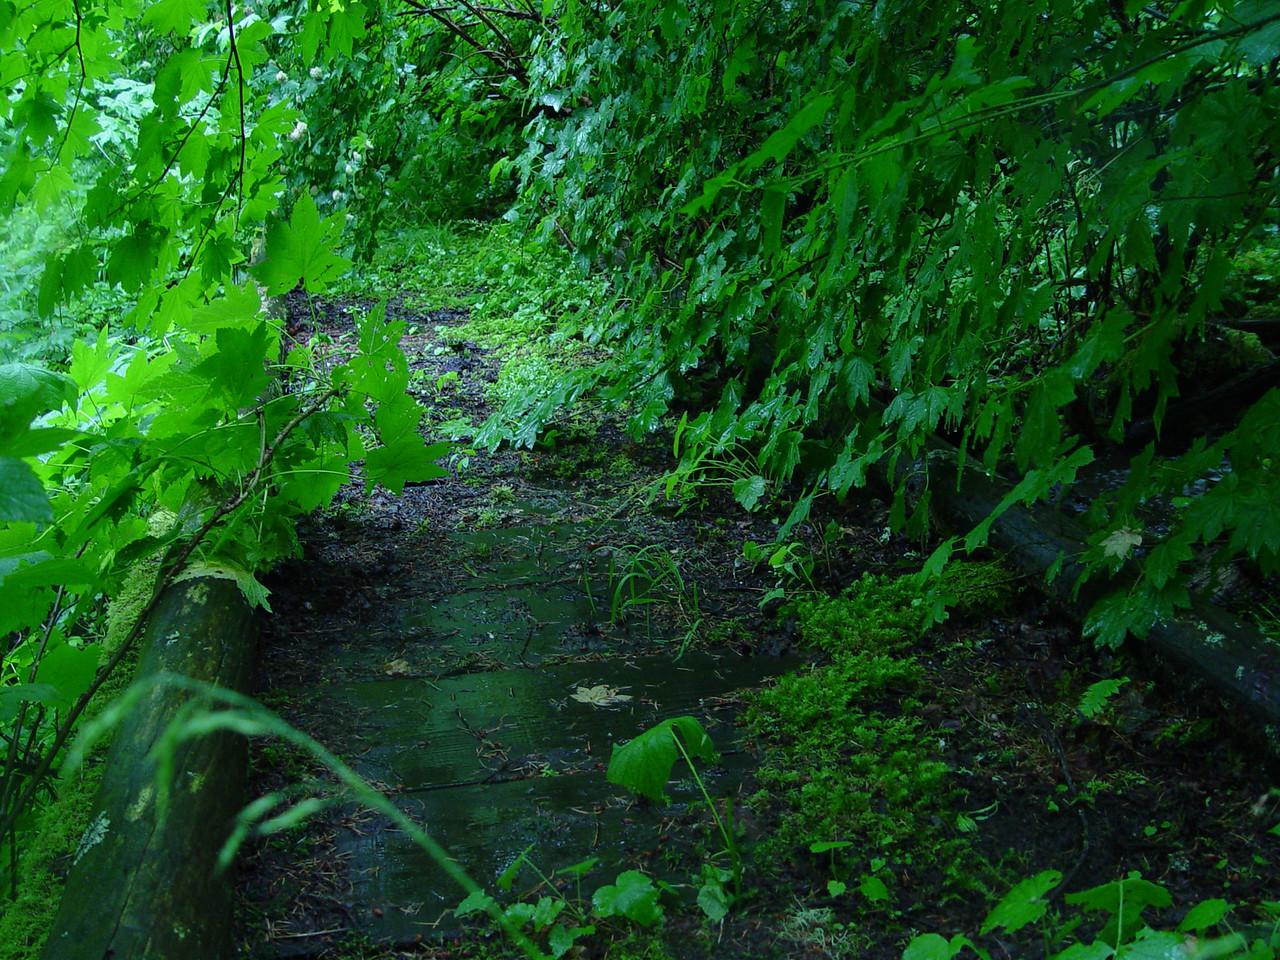 The Shady Creek footbridge was still in very good condition.